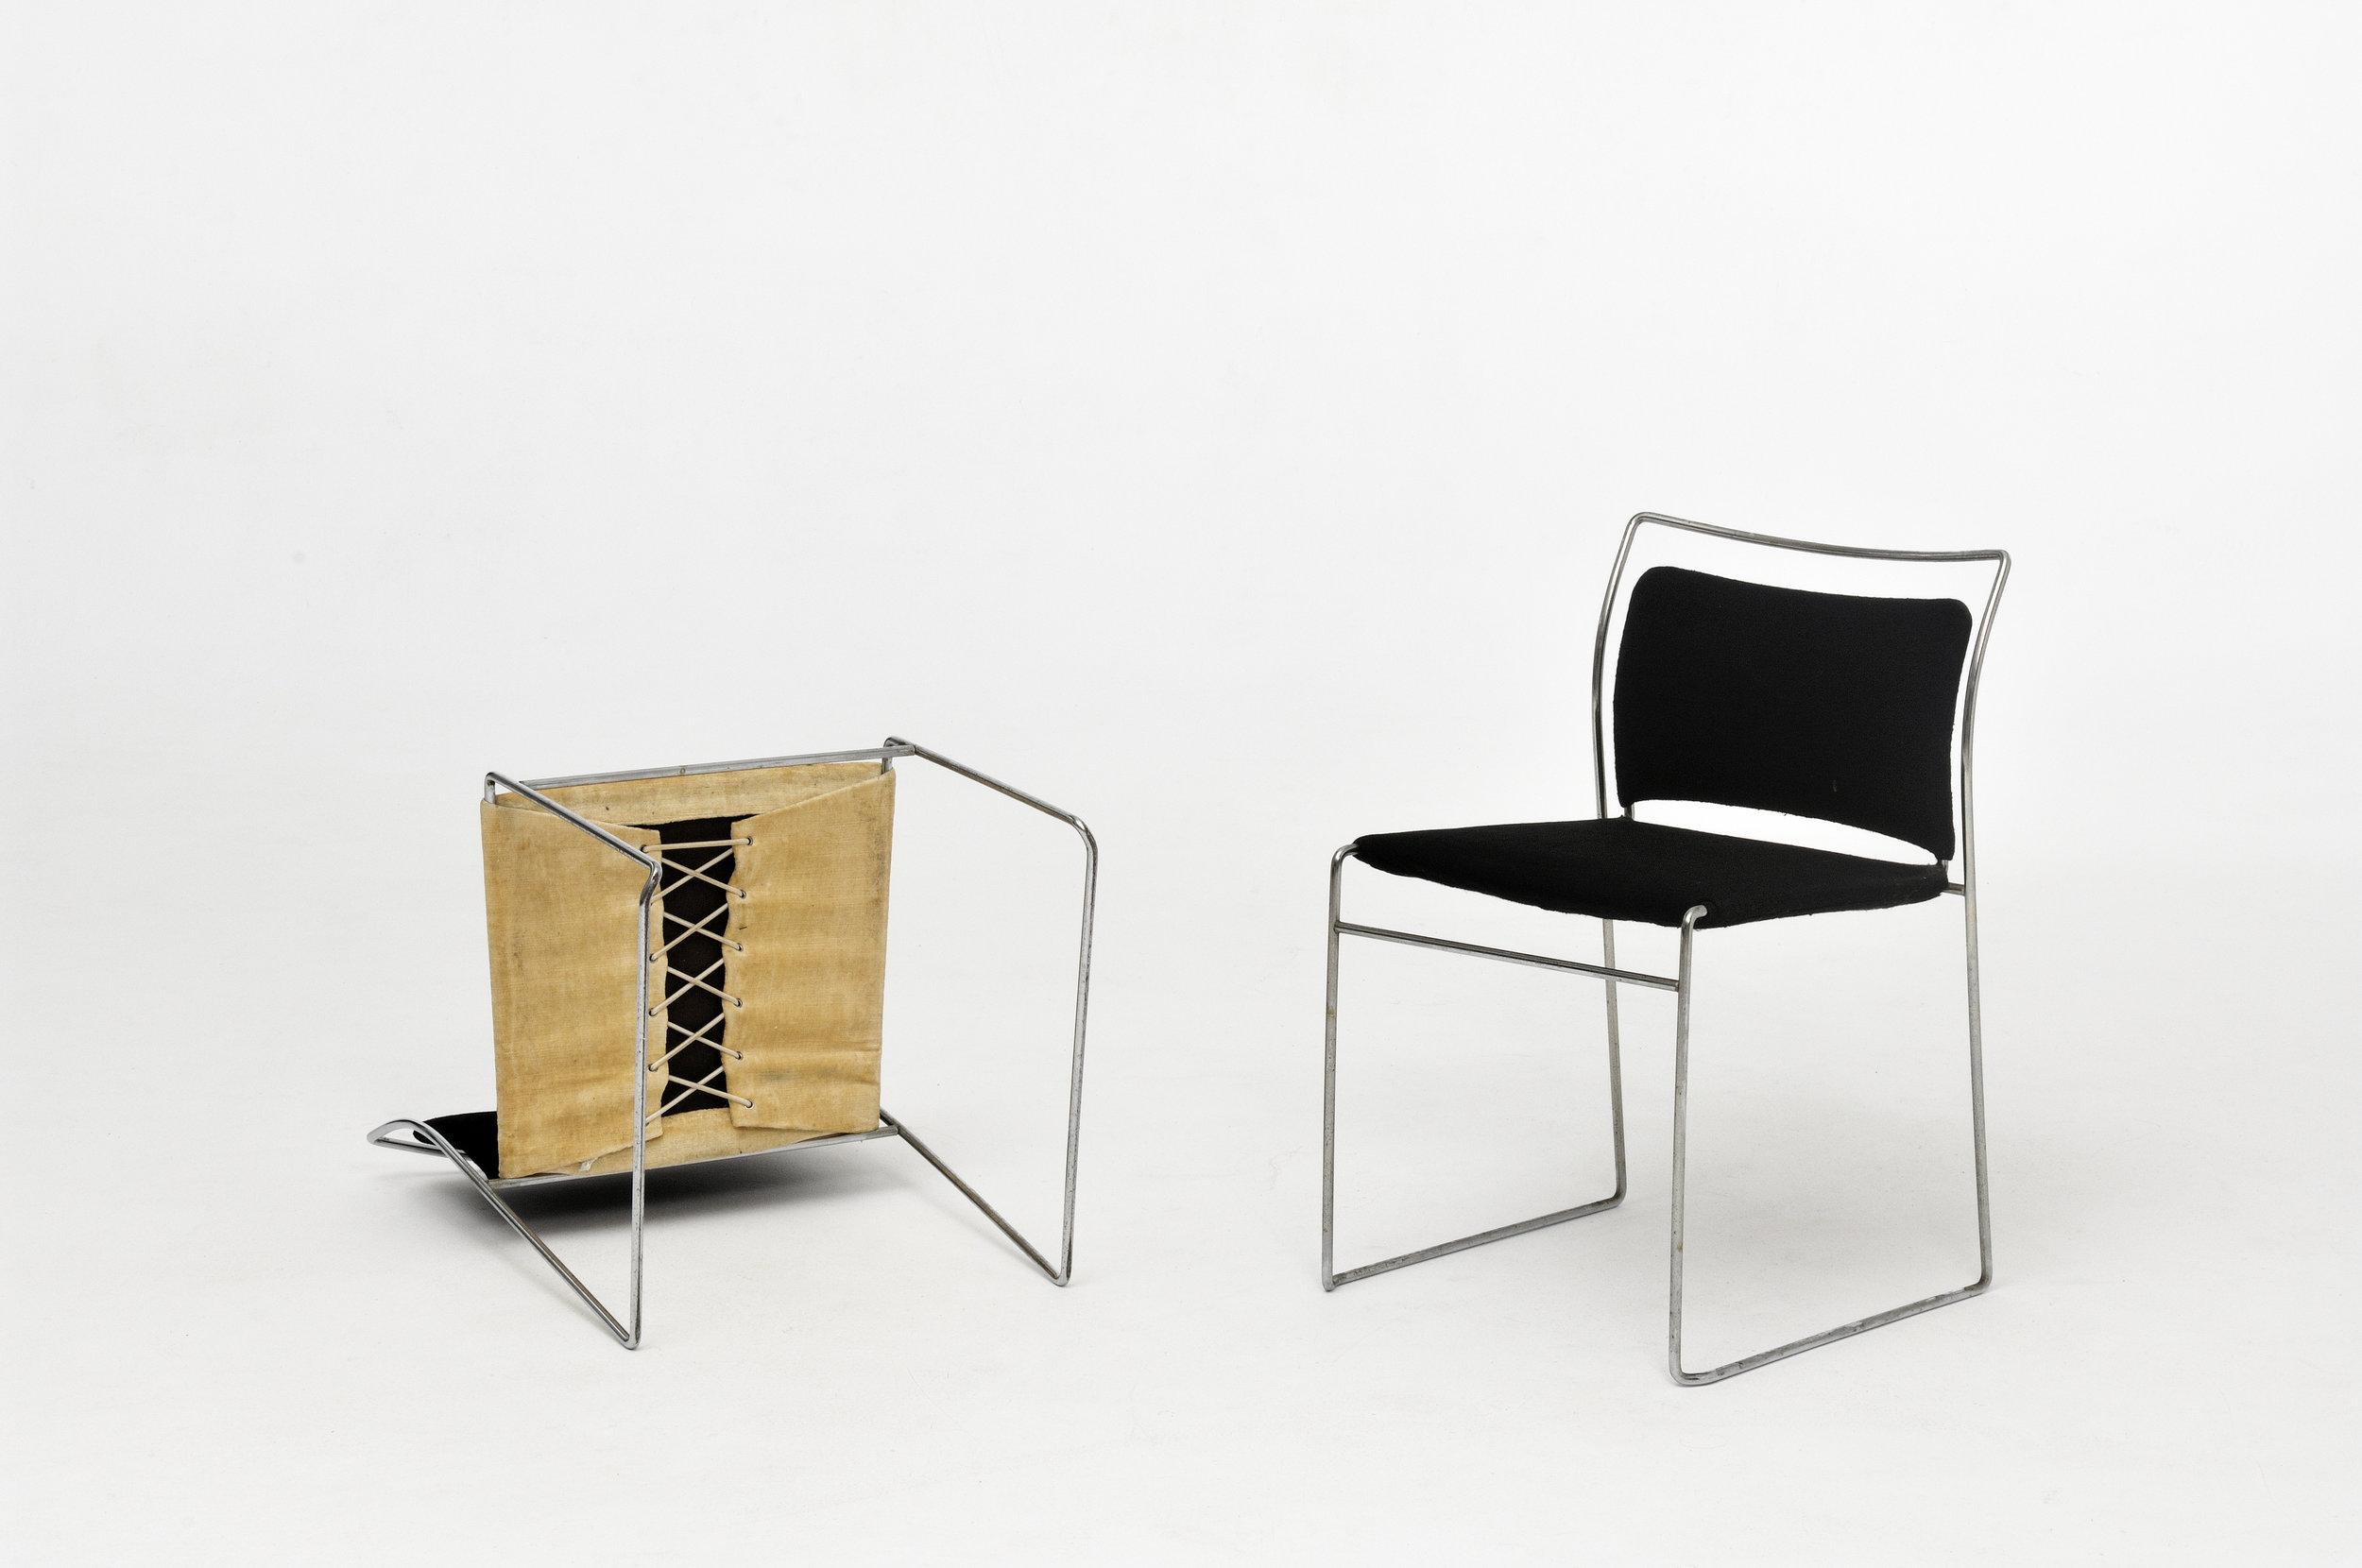 works - XXth / MODERN / CONTEMPORARY DESIGN